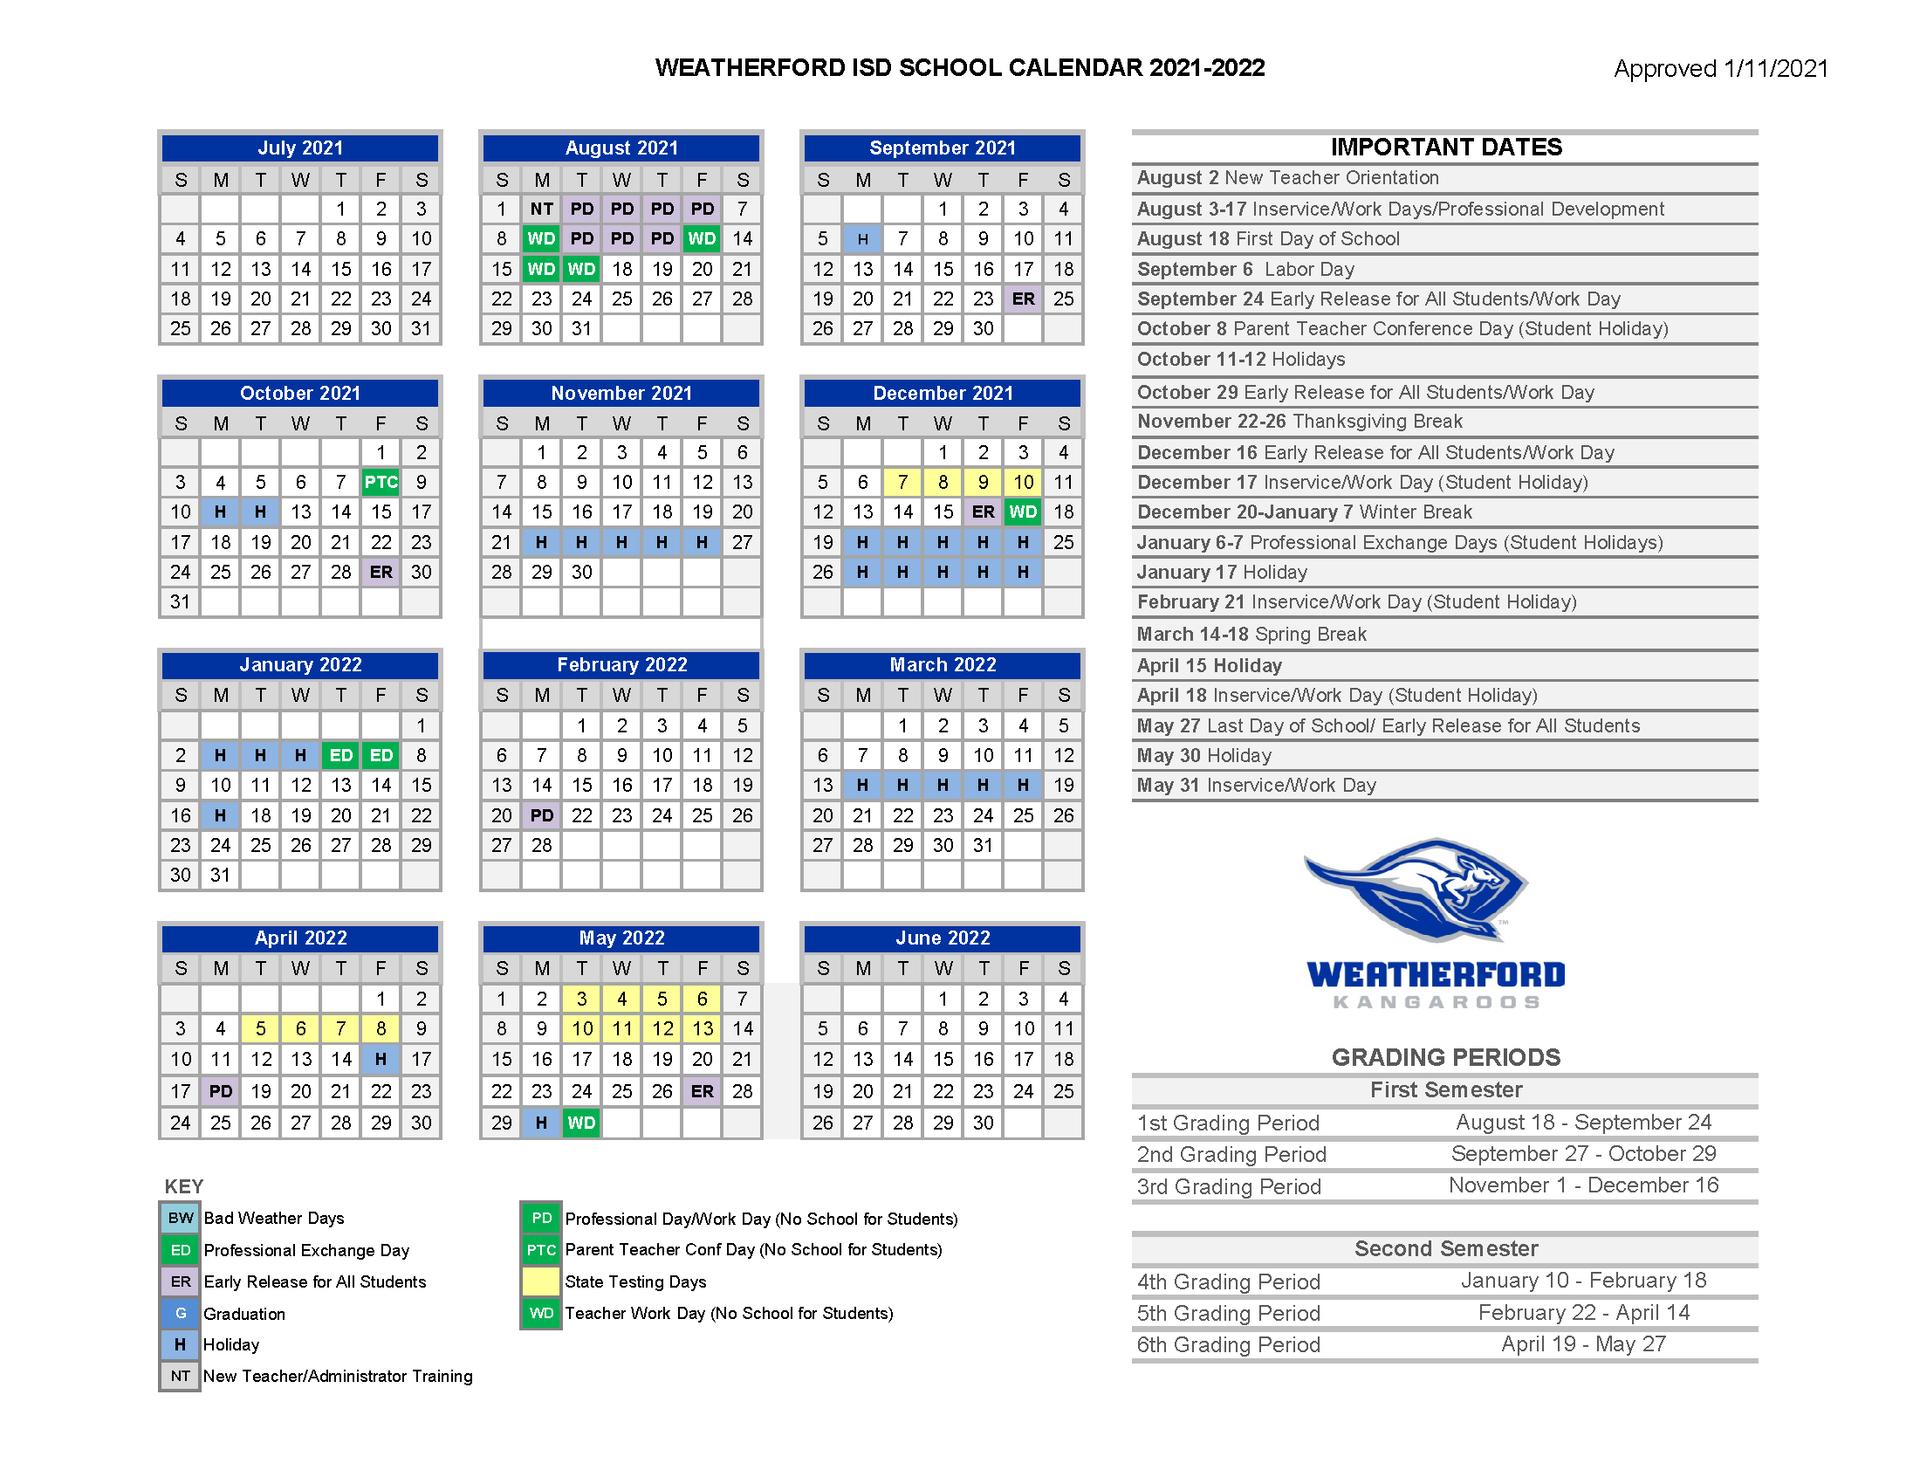 2021-2022 WISD School Calendar